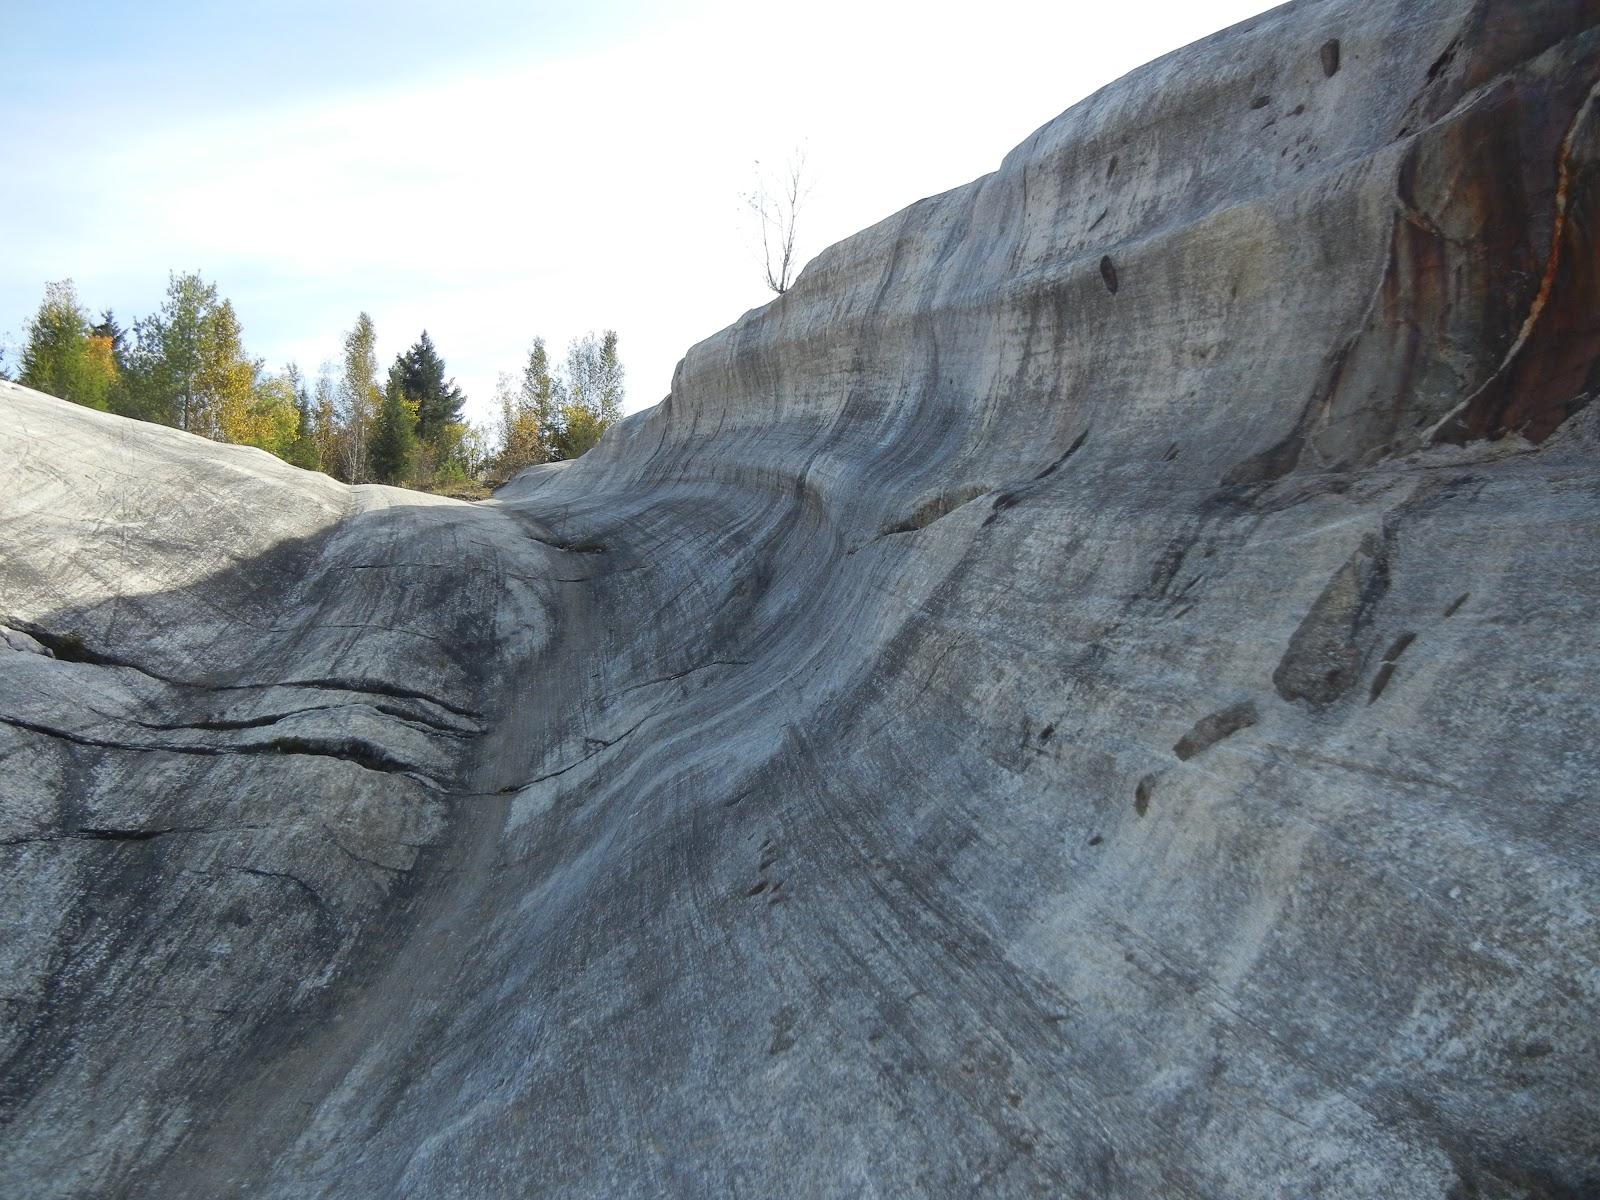 ice erosion pictures - photo #29